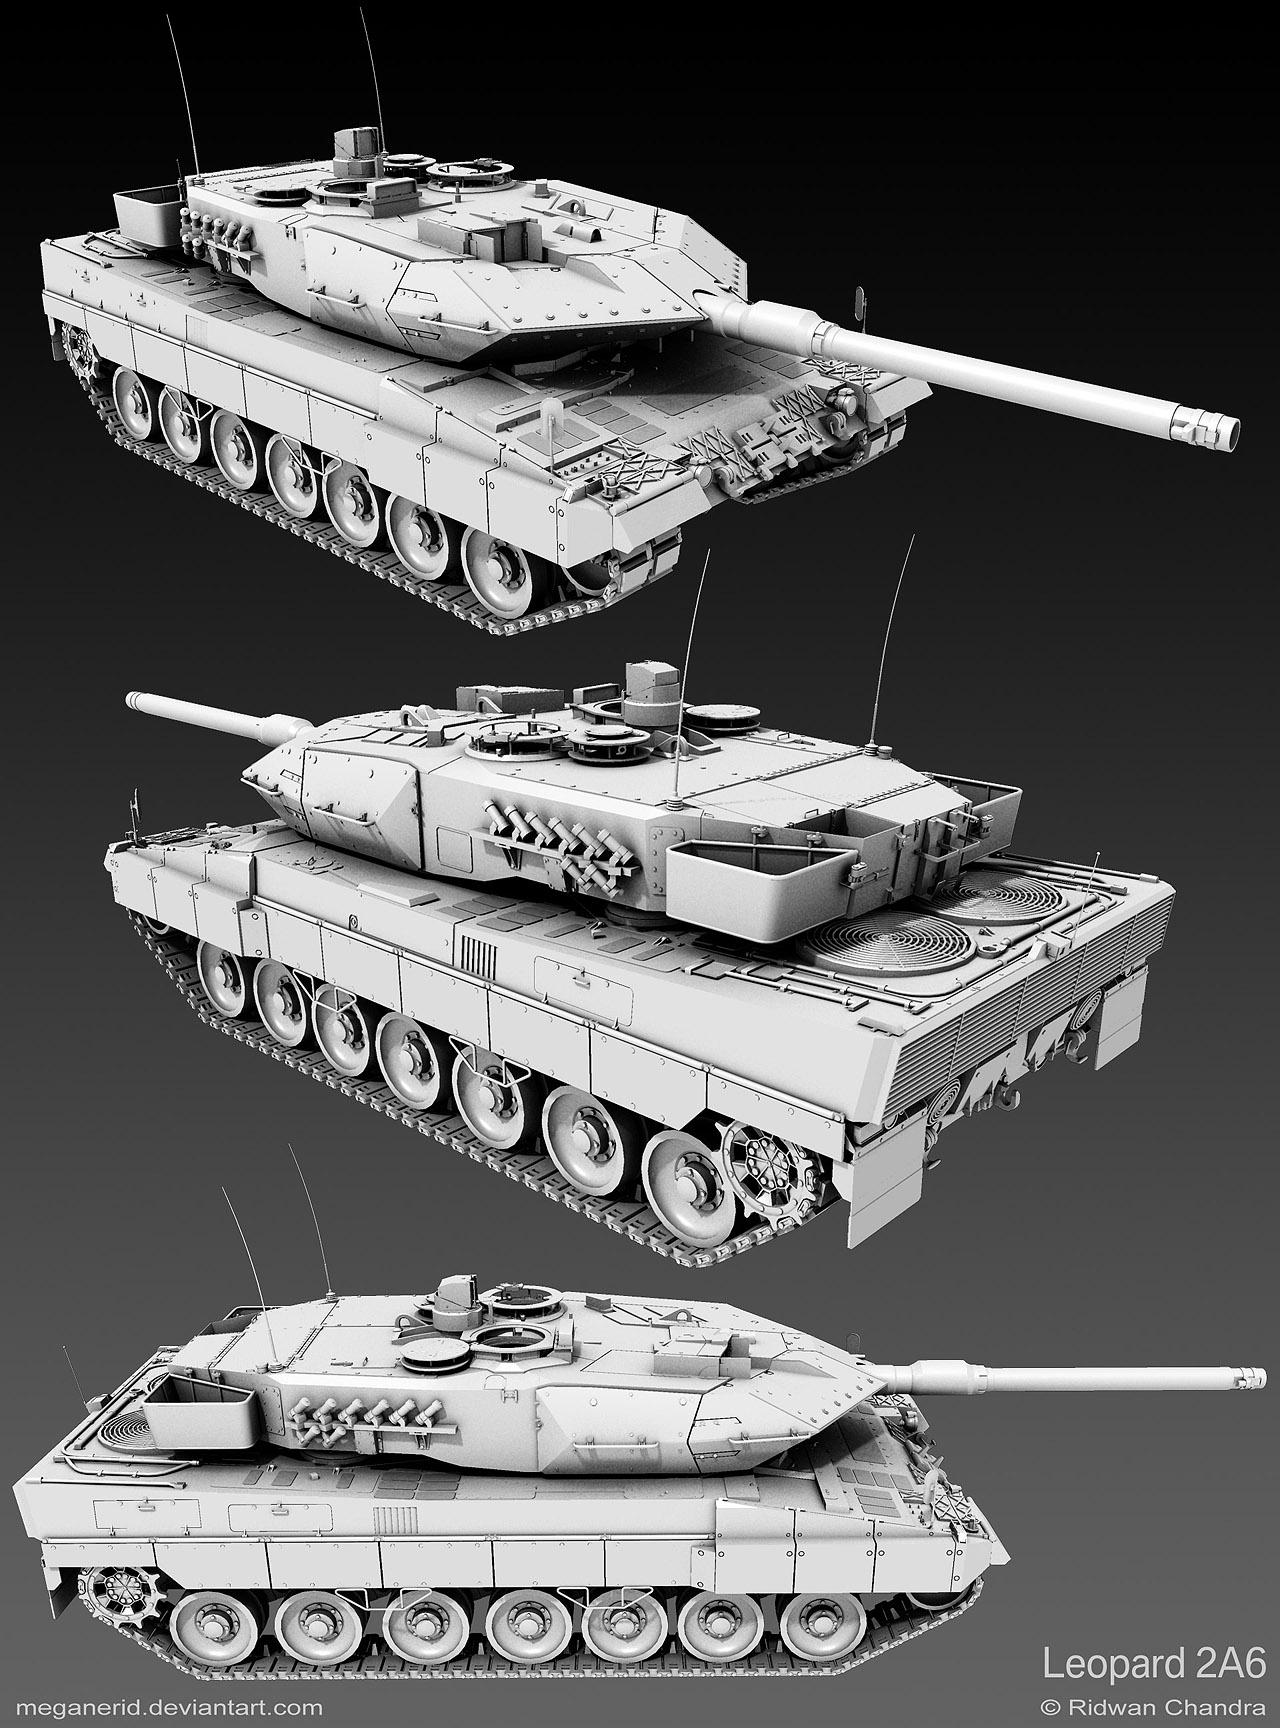 Leopard 2 tank by meganerid on deviantart leopard 2 tank by meganerid leopard 2 tank by meganerid malvernweather Choice Image